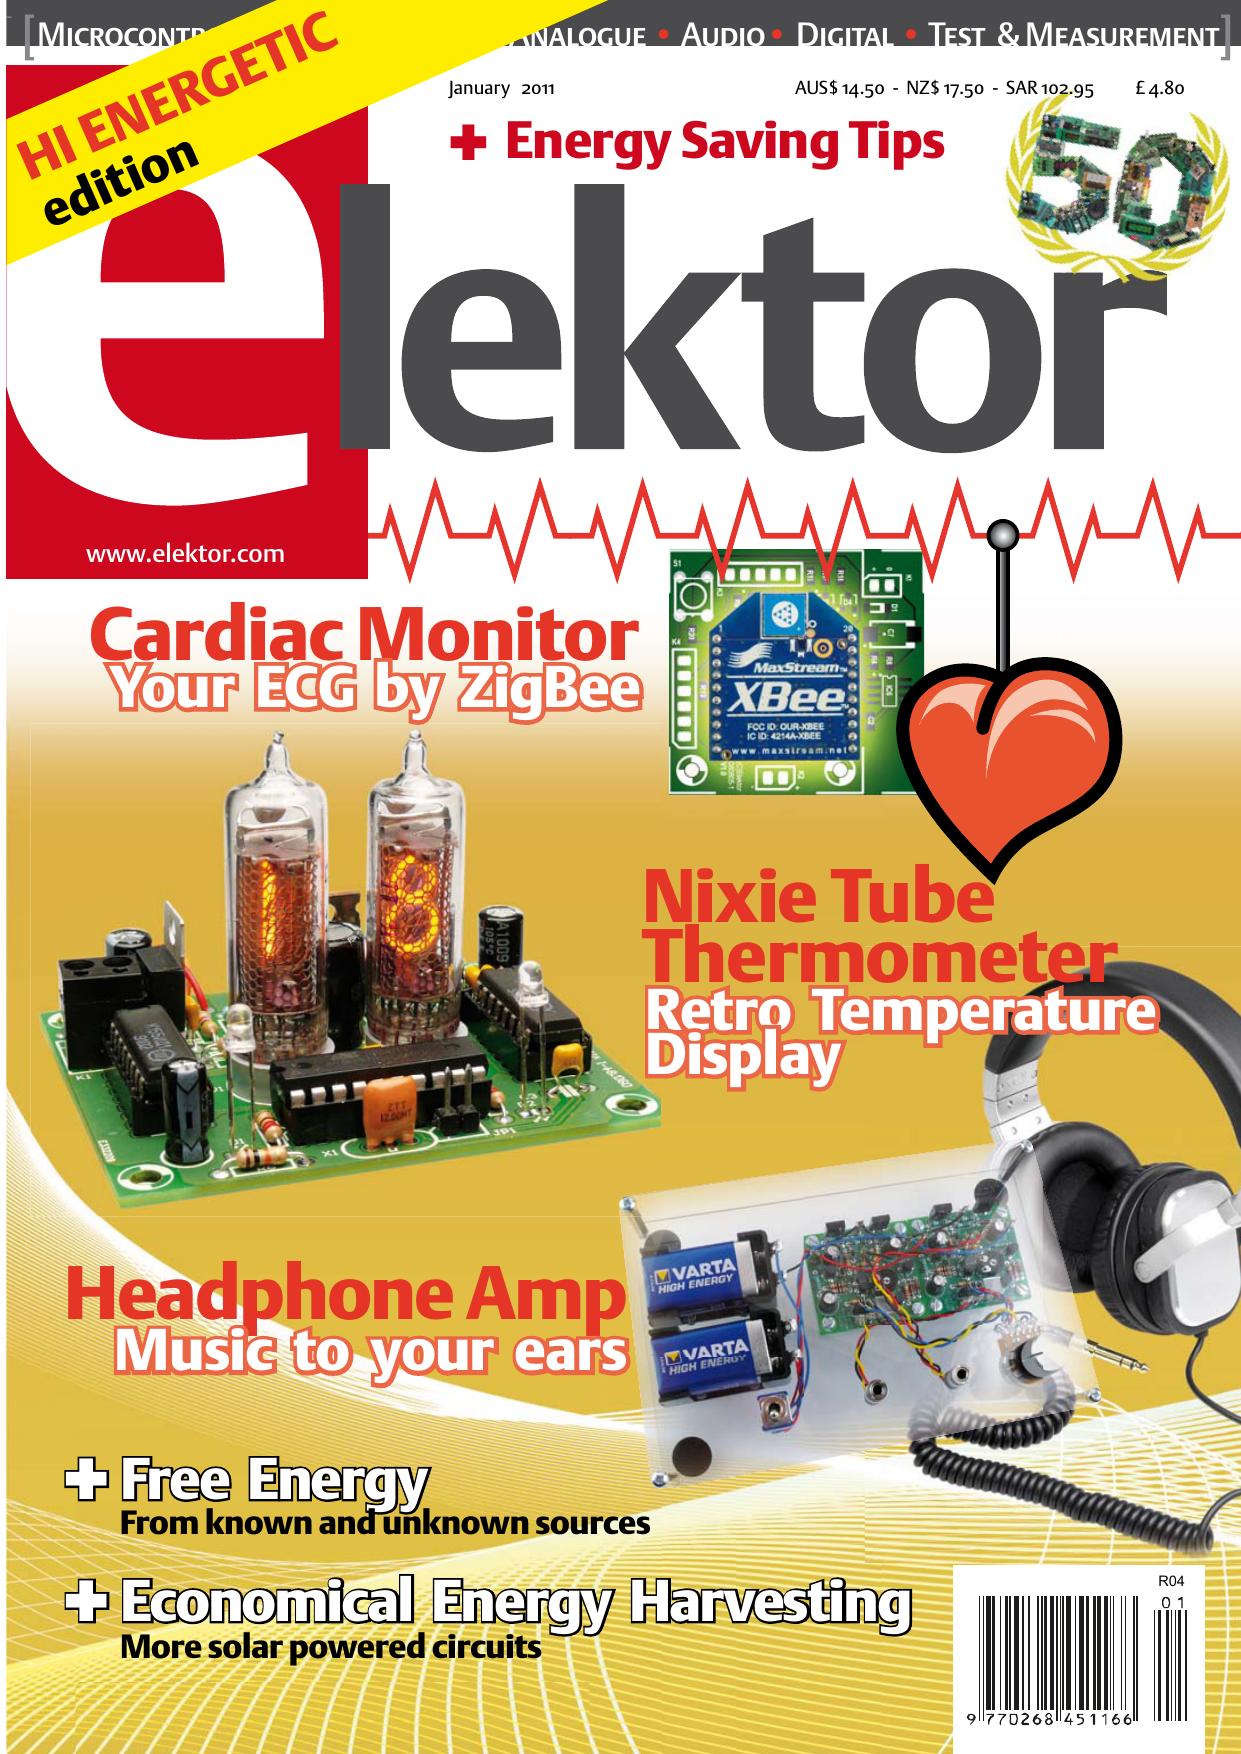 Headphone Amp Nixie Tube Thermometer Cardiac Monitor